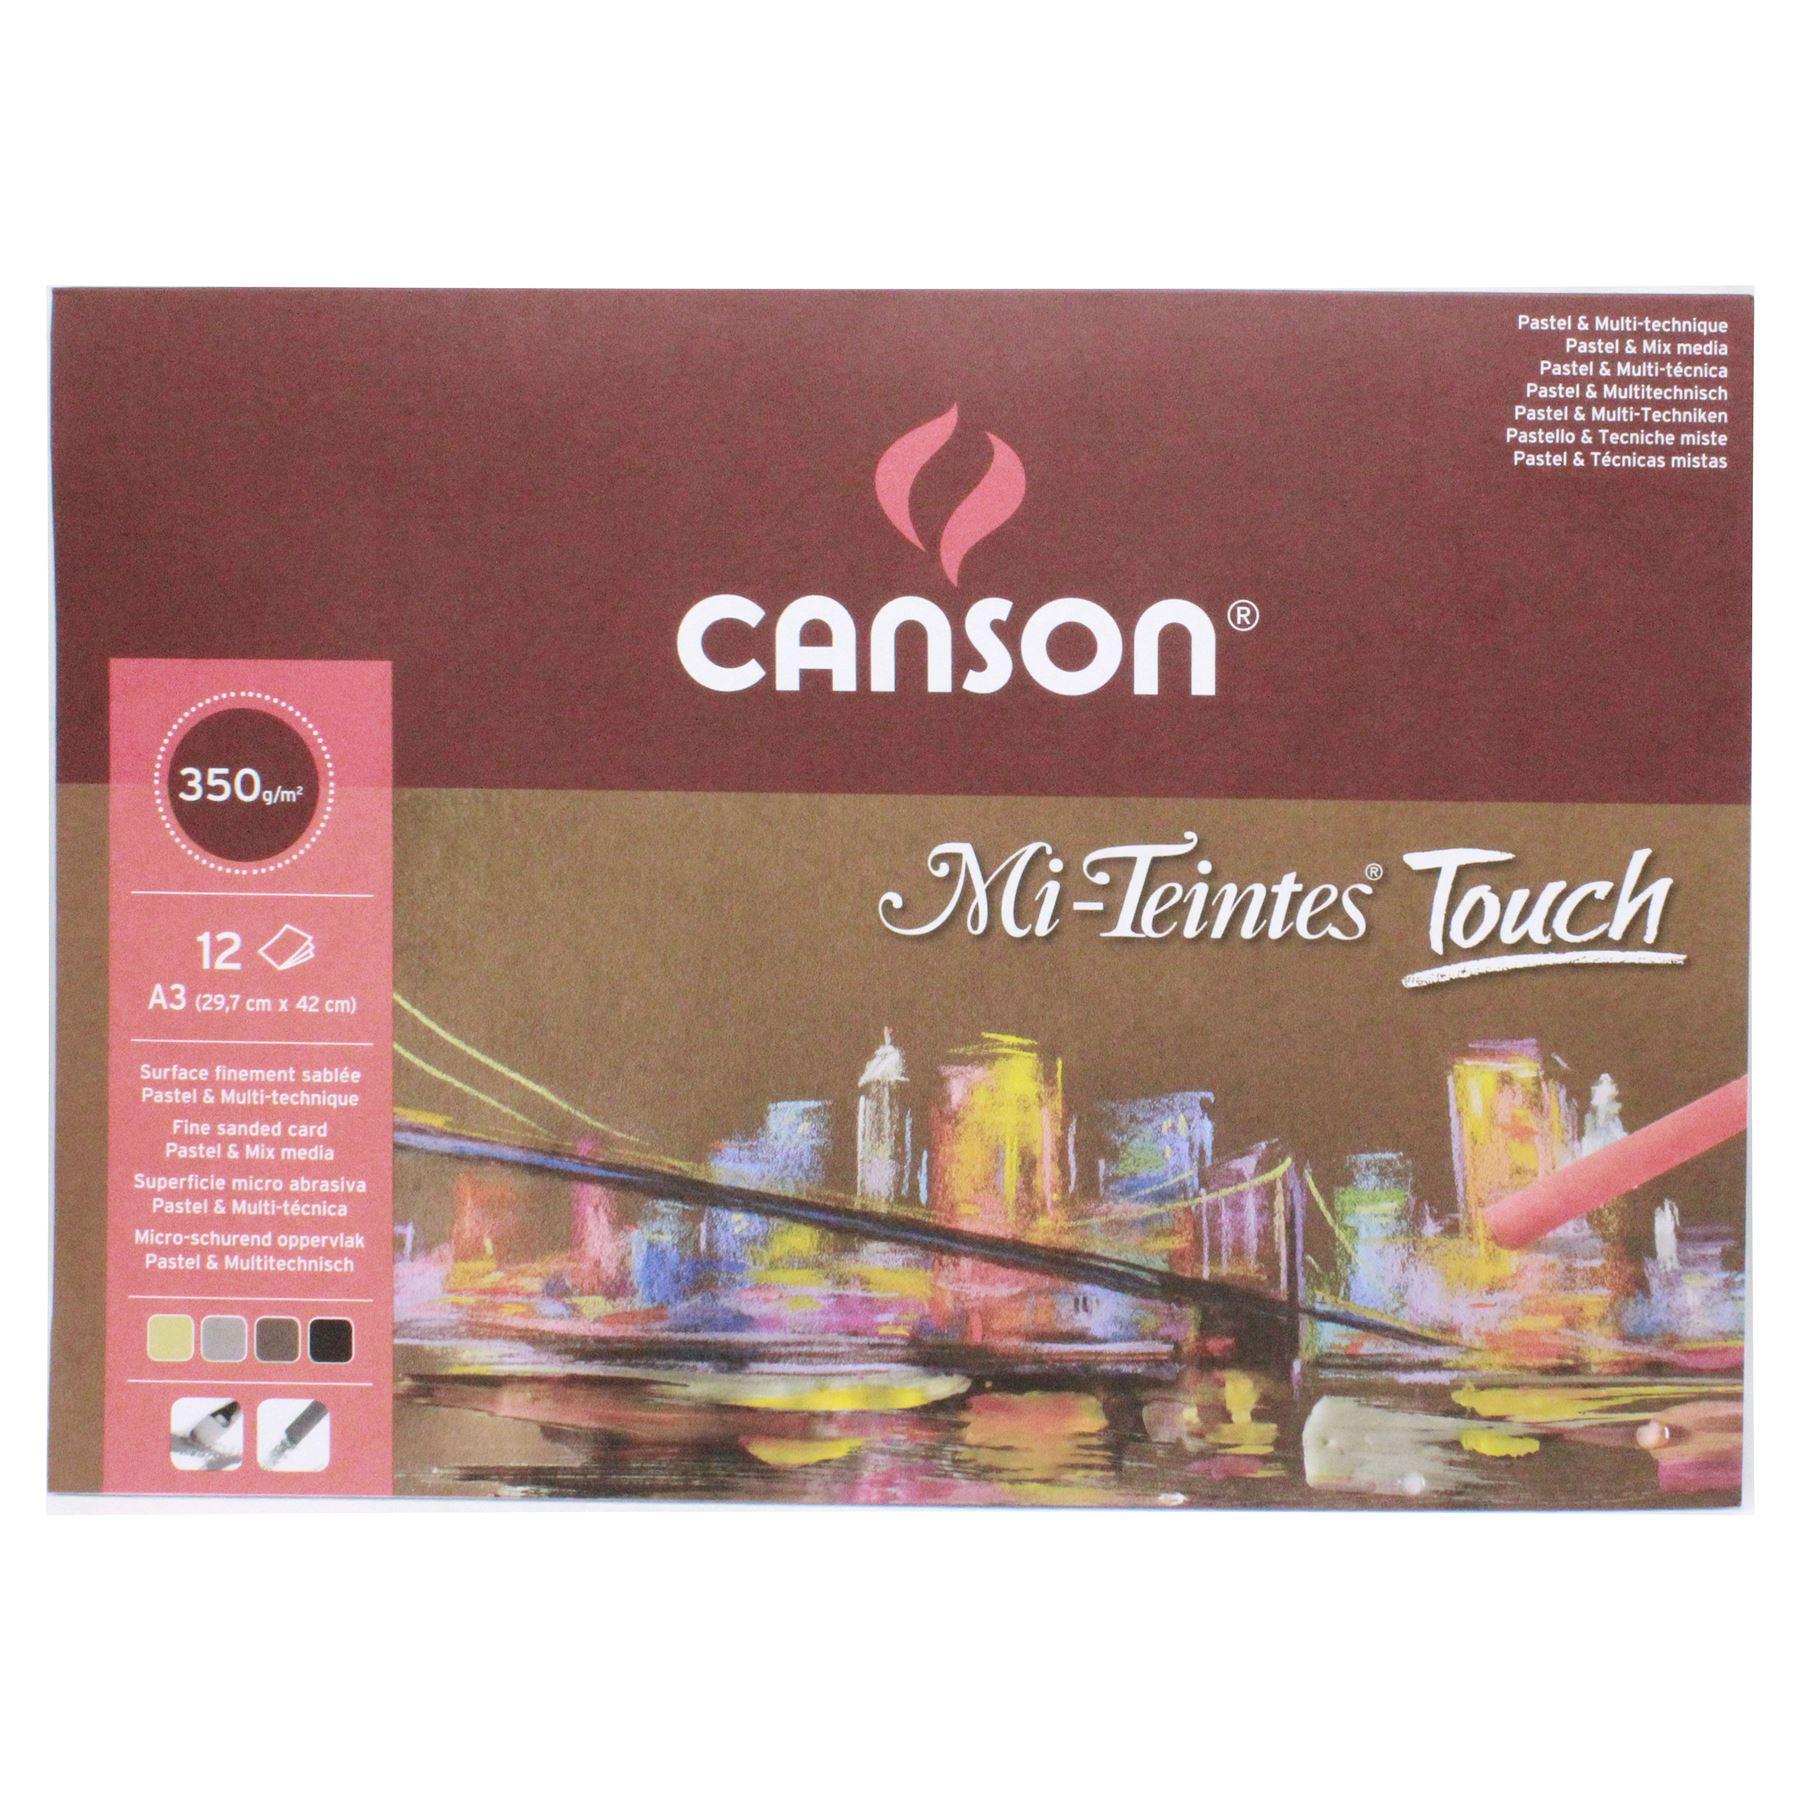 sand-paper-texture-pastel-paper-canson-Mi-Teintes-touch-soft-pastel-pad thumbnail 9